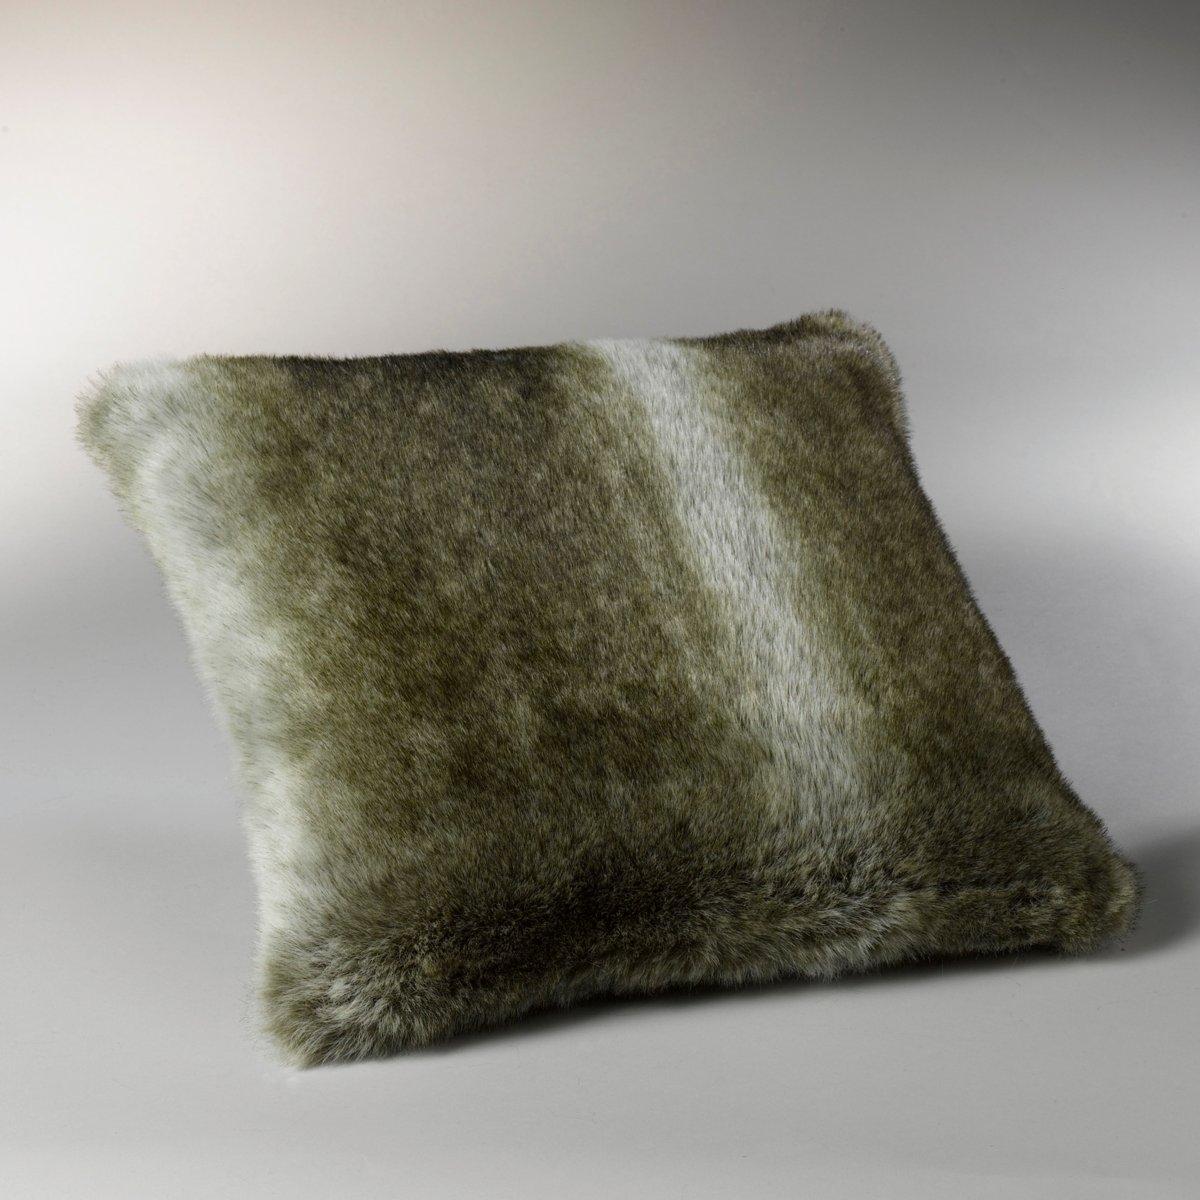 Чехол La Redoute Для подушки из искусственного меха BAZSO 40 x 40 см серый чехол для подушки из шерсти osia